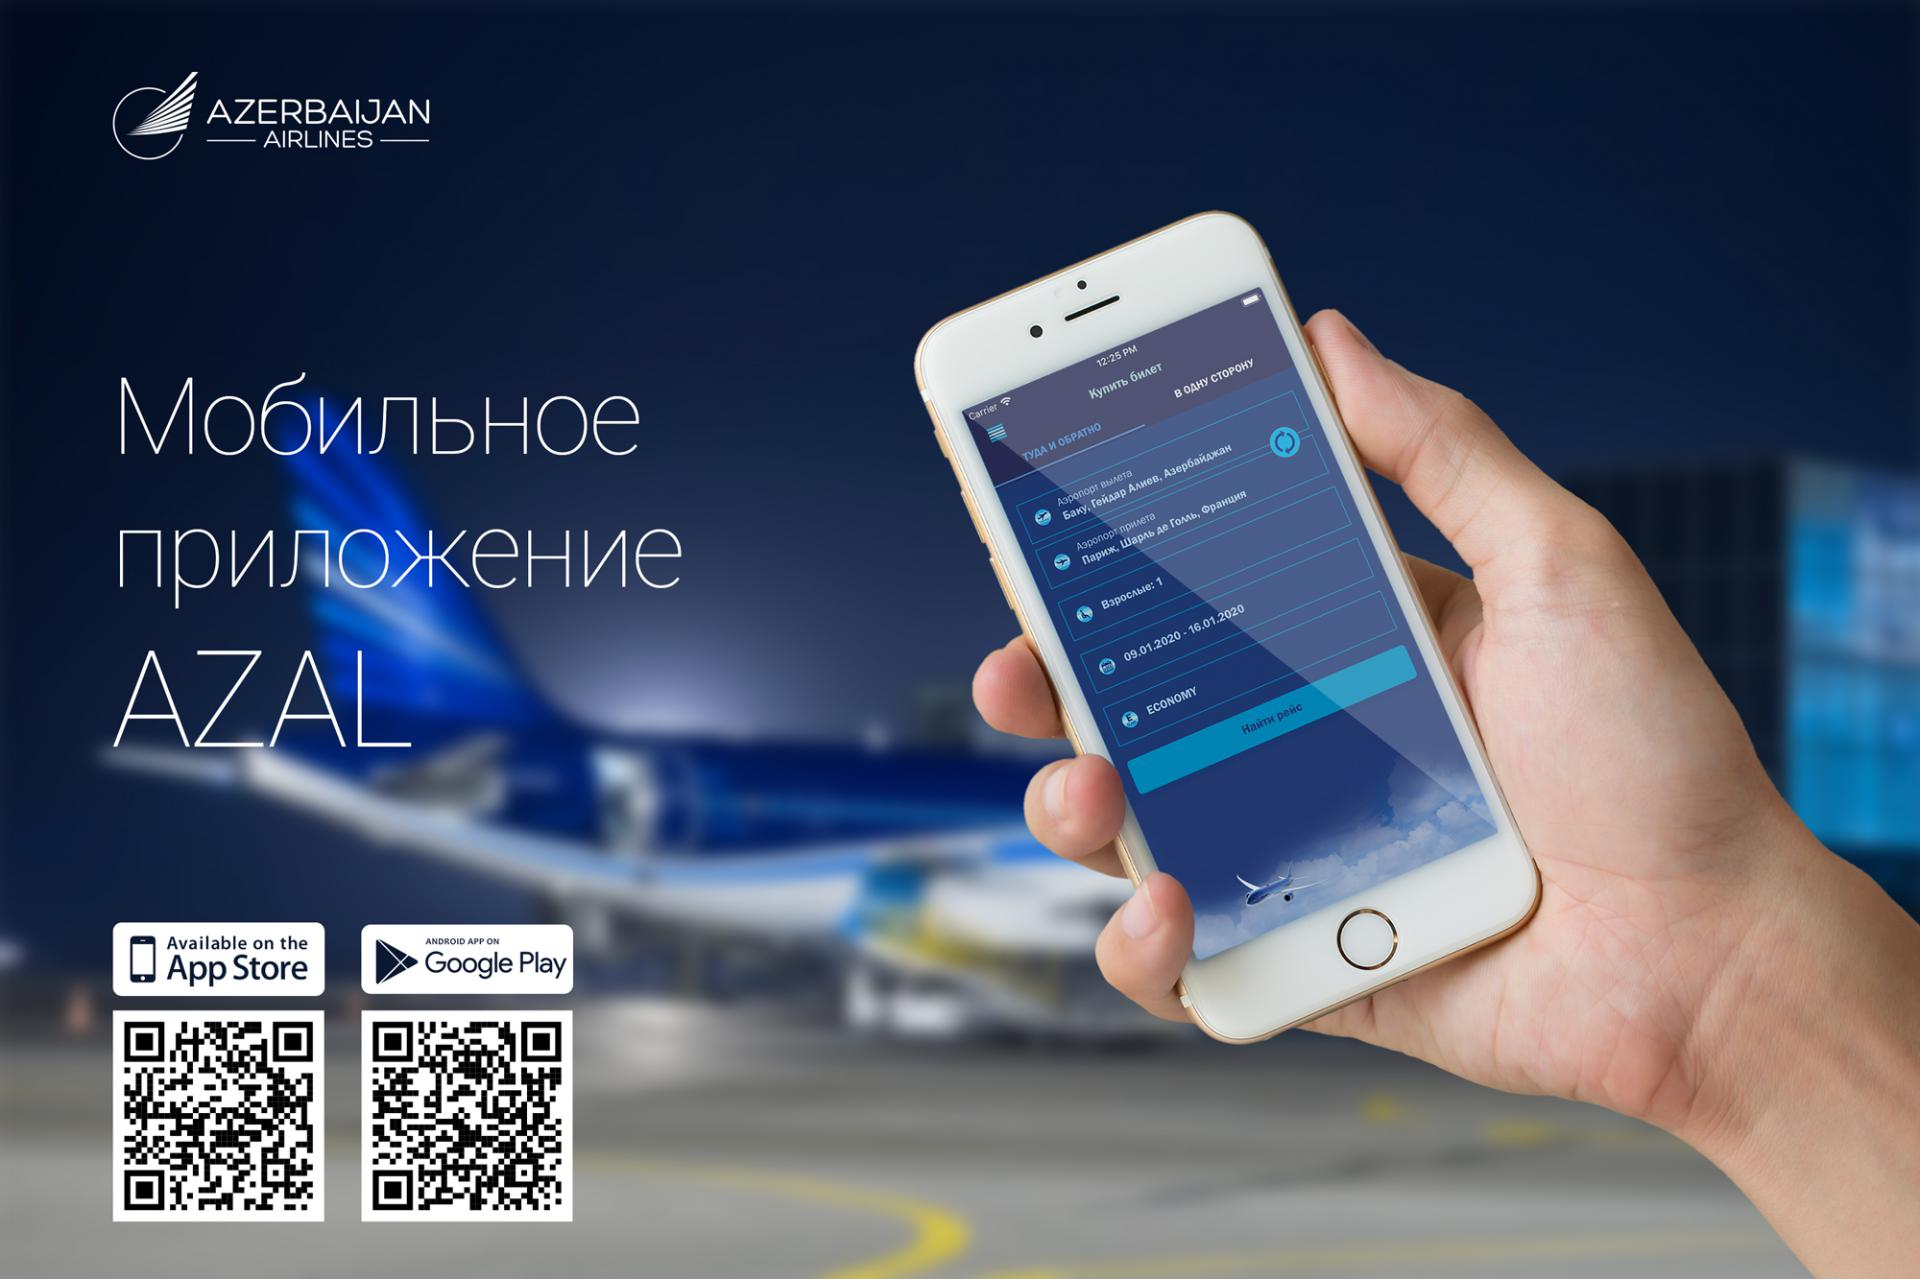 azal_app_ru.jpg